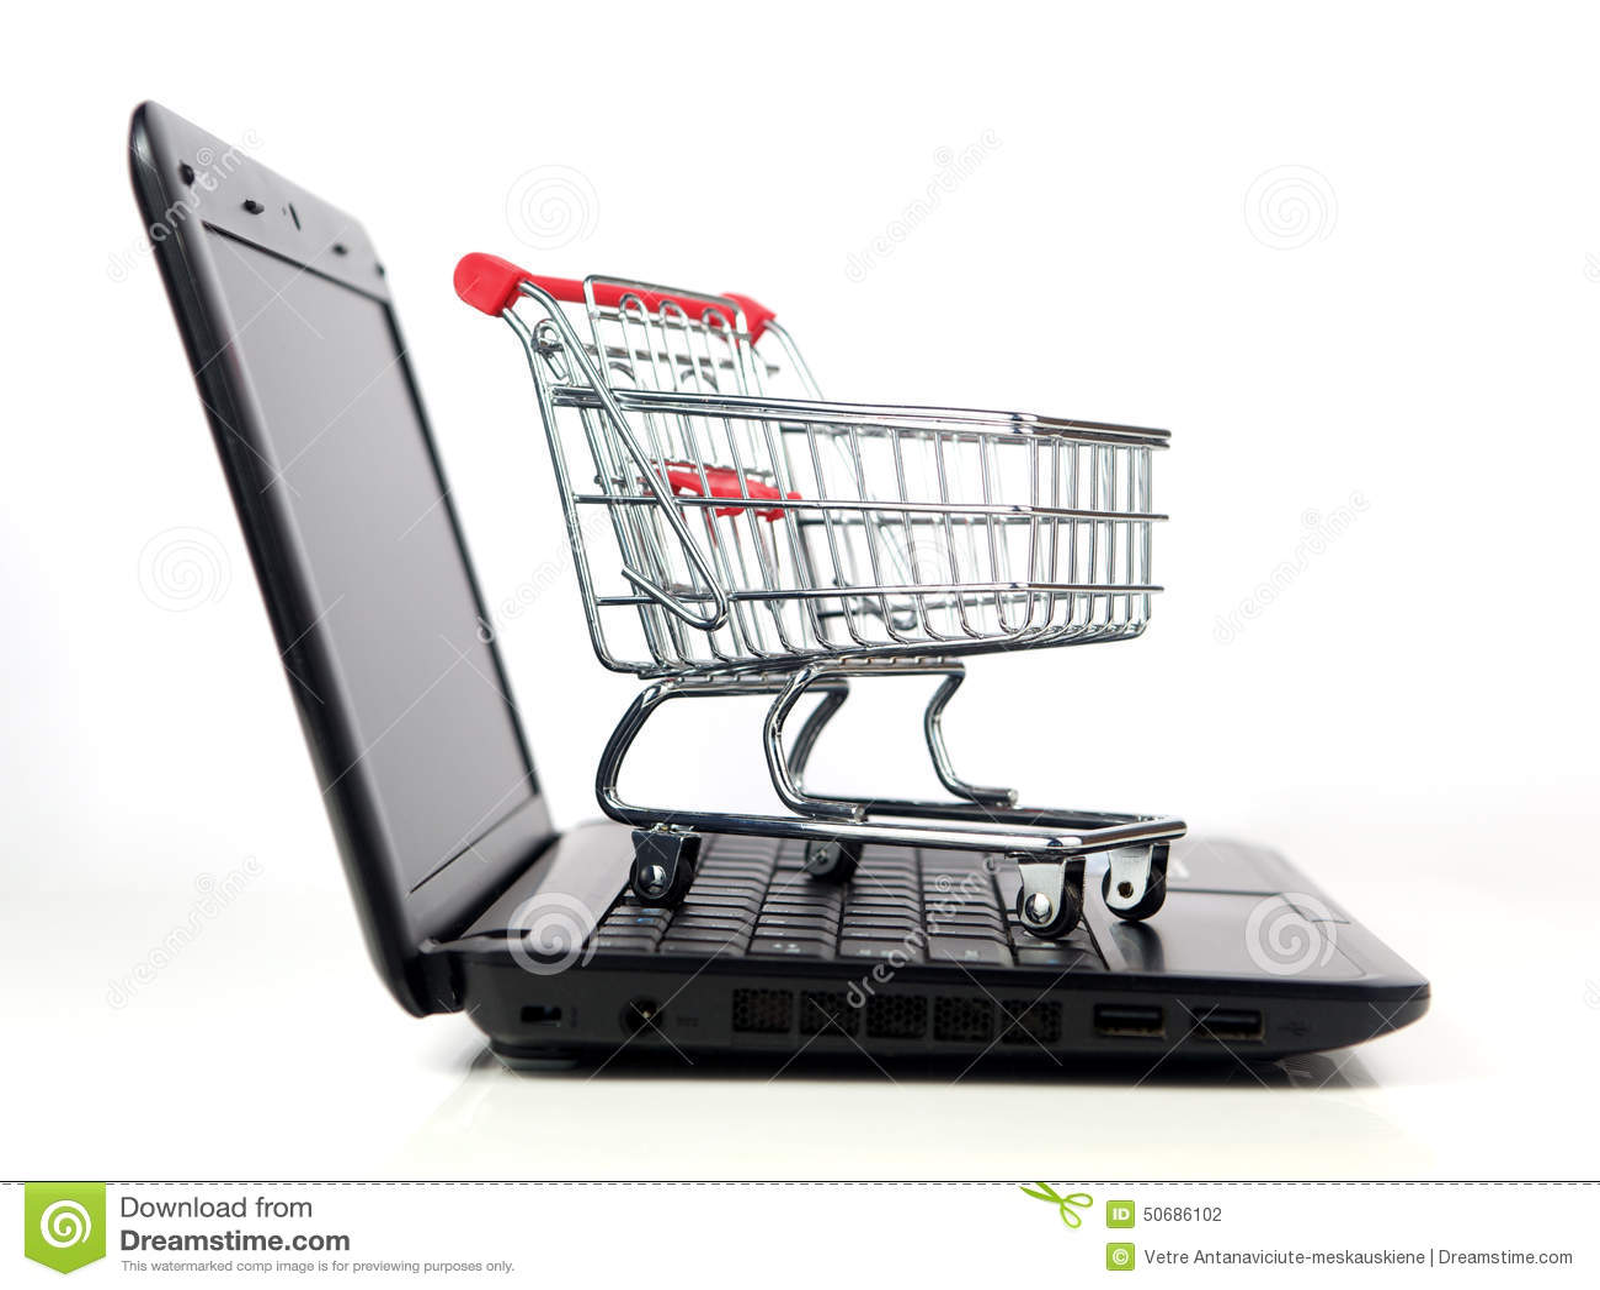 Download 在计算机上的购物袋 库存照片. 图片 包括有 采购, 概念, 市场, 销售额, 诱饵, 程序包, 购物车 - 50686102